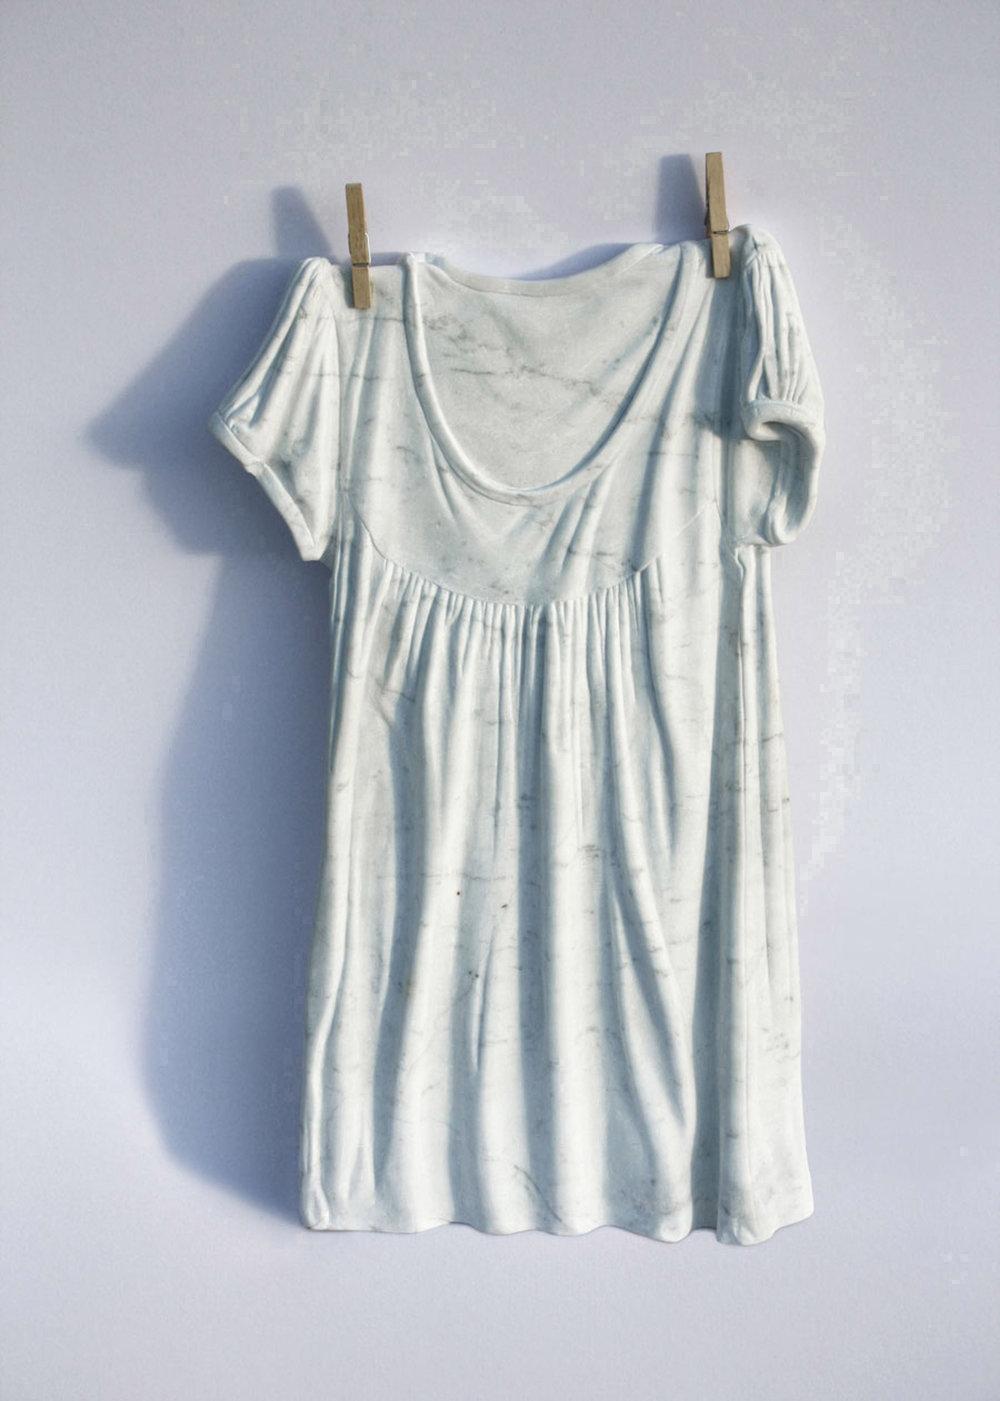 Alasdair-Thomson-Marble-Dress-Sculpture-2.jpg